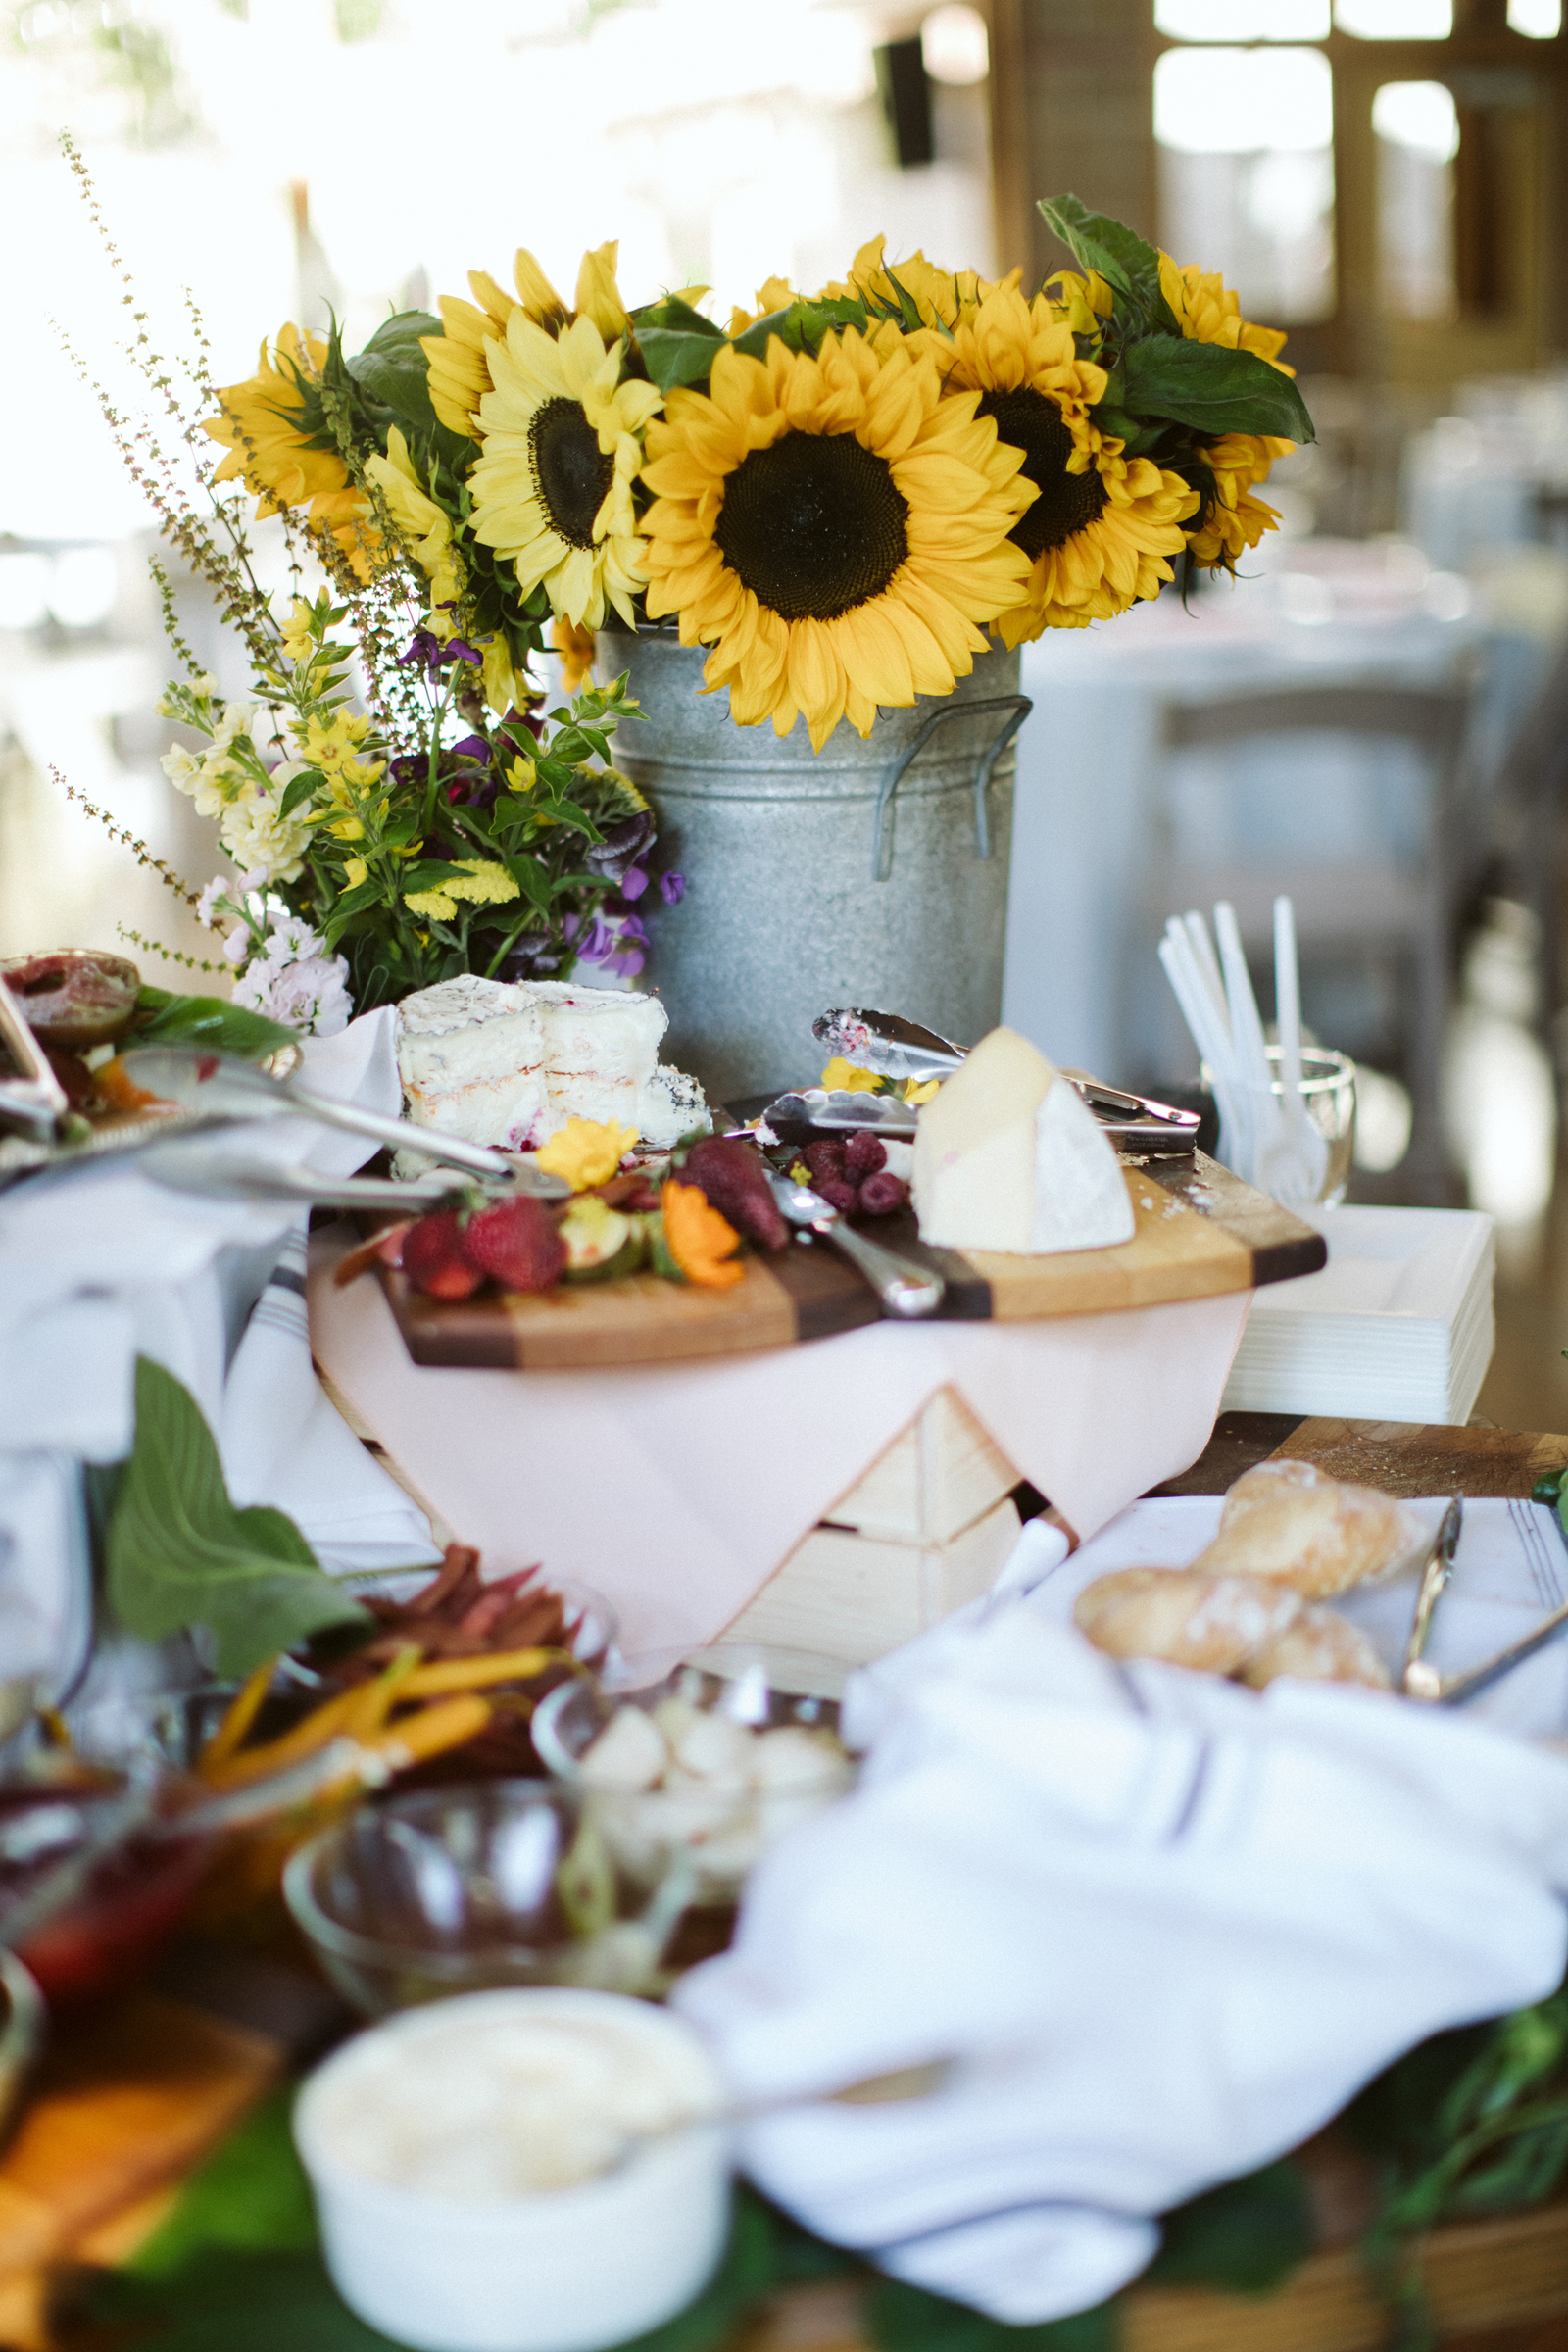 069-daronjackson-rachel-michael-wedding-mtpisgah.jpg